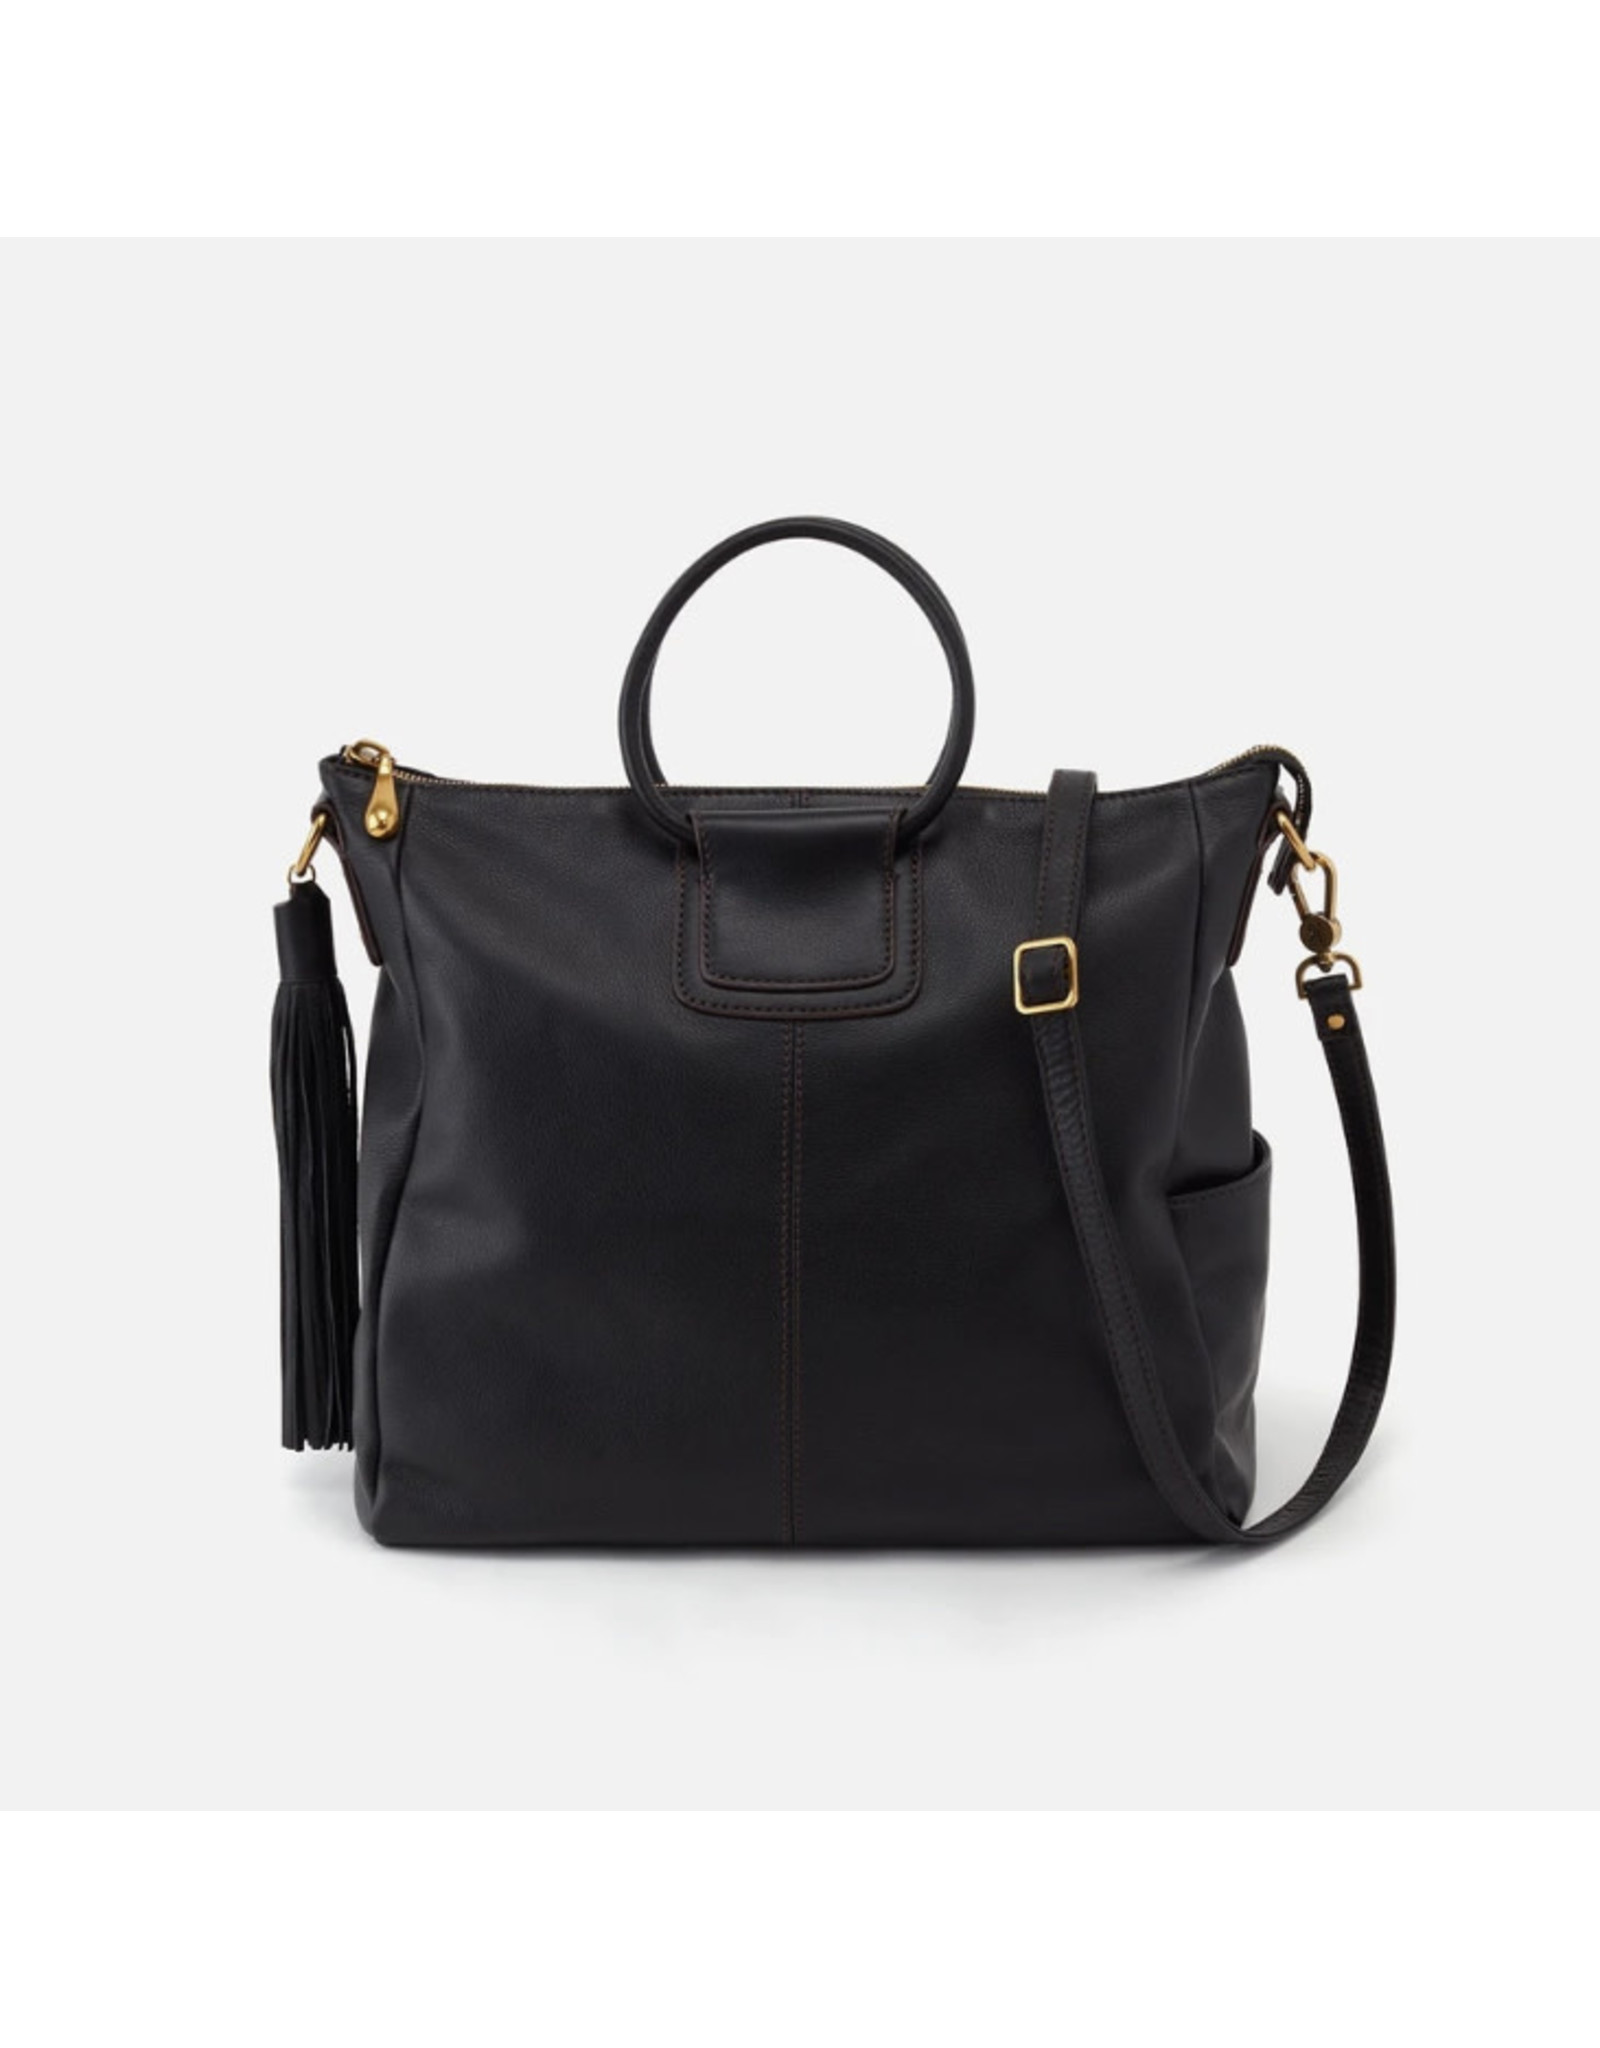 Hobo Sheila Convertible Bag